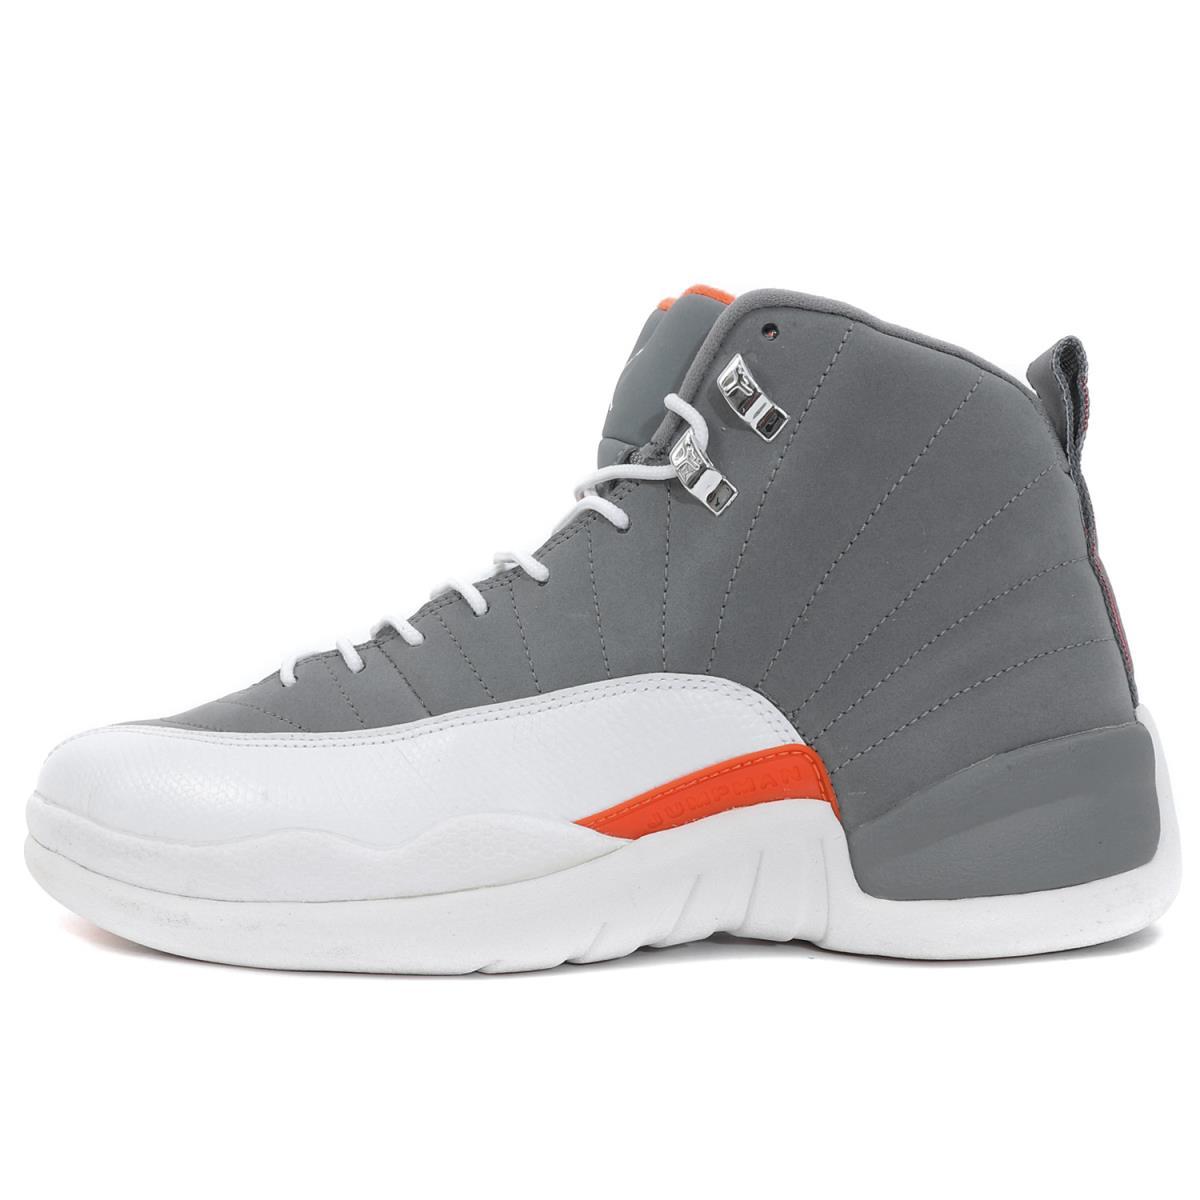 93565878c08af NIKE (Nike) AIR JORDAN 12 RETRO COOL GREY (130,690-012) cool ...